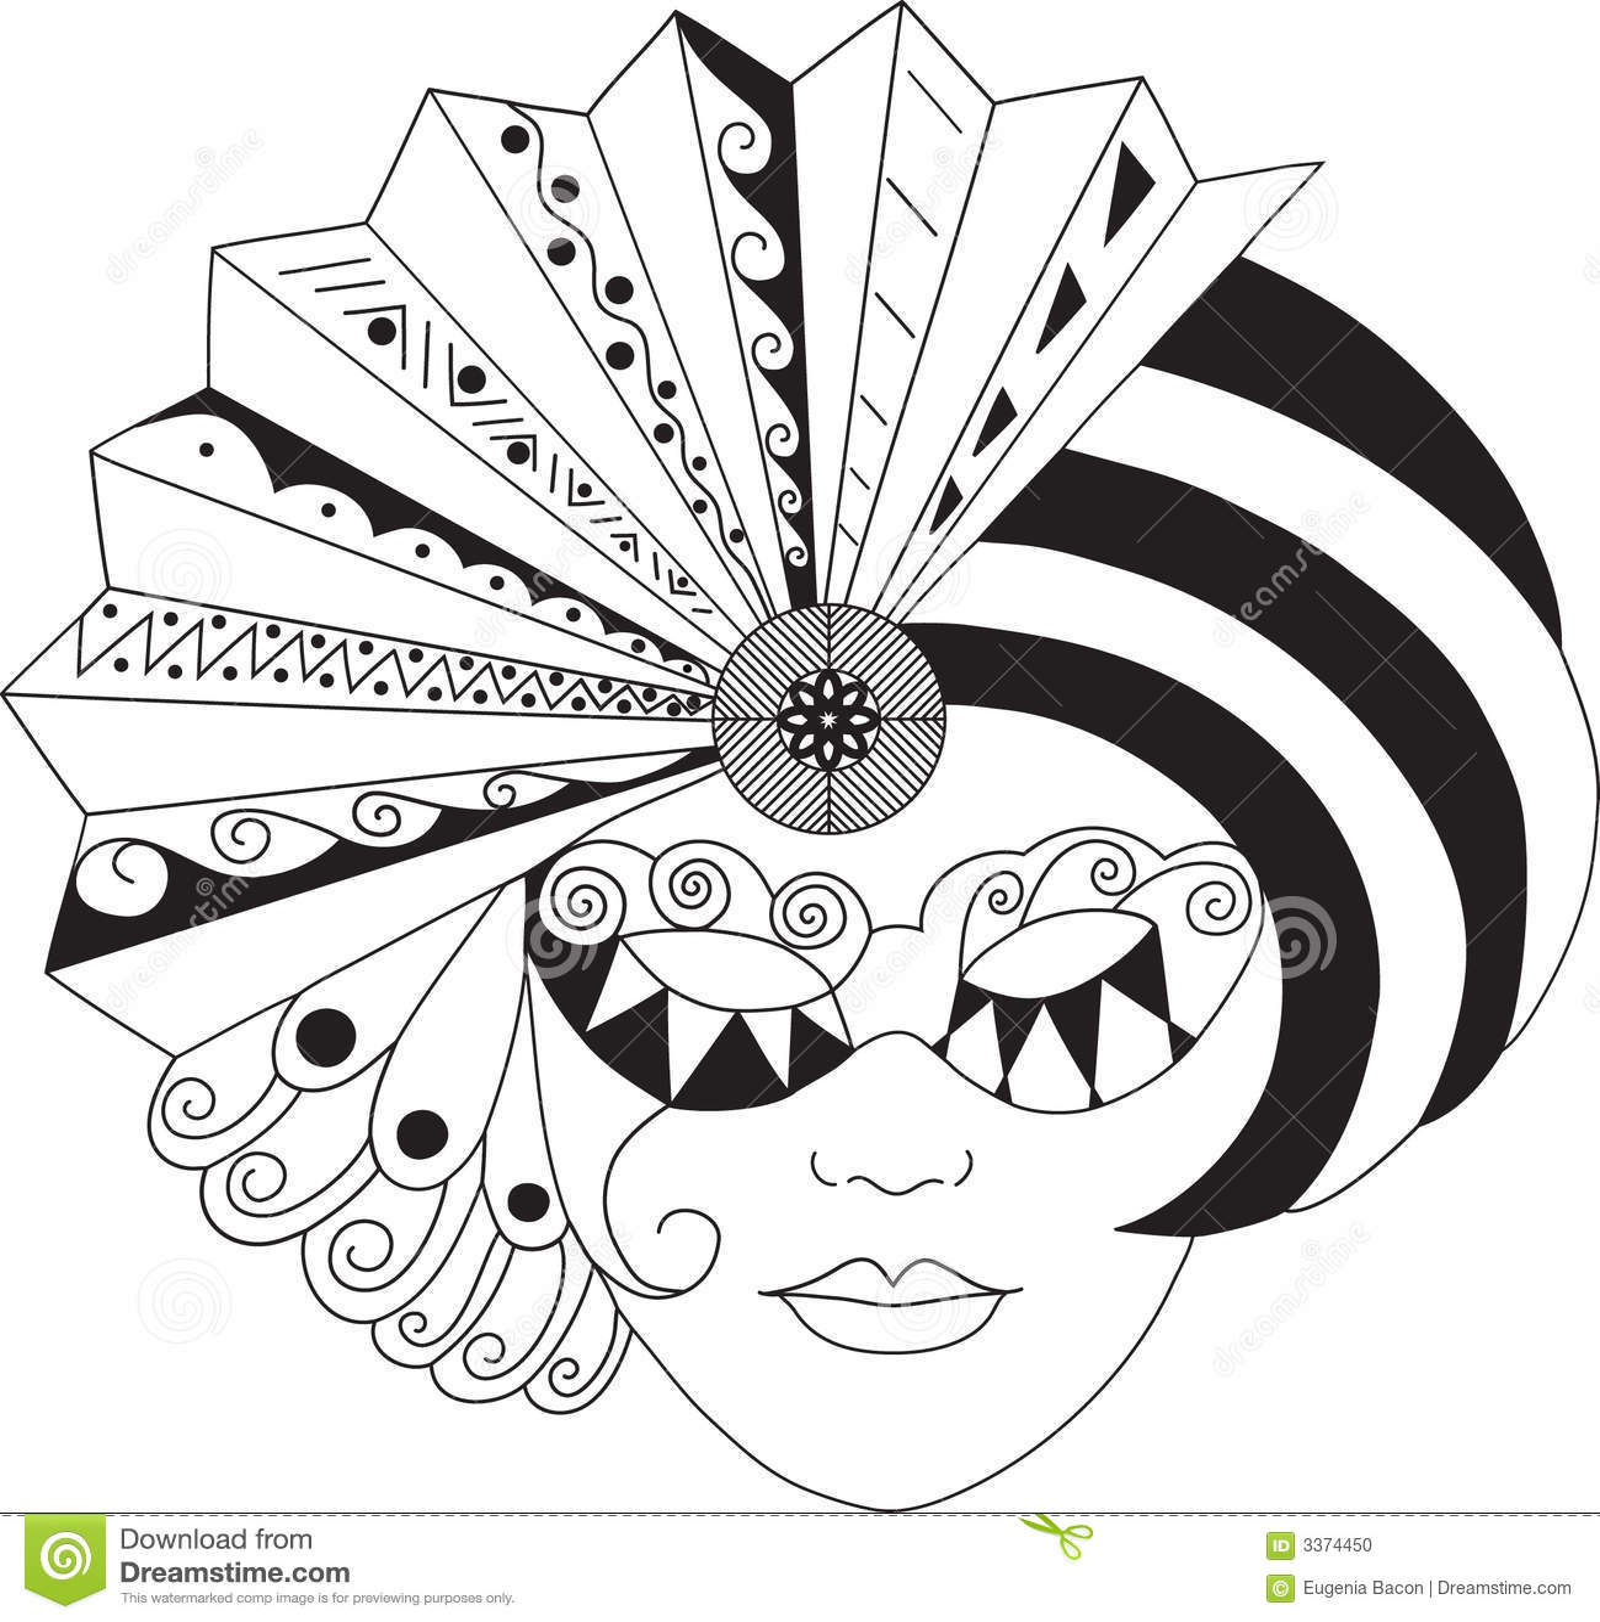 Graphic vector mask stock vector. Illustration of mardigras - 4255697